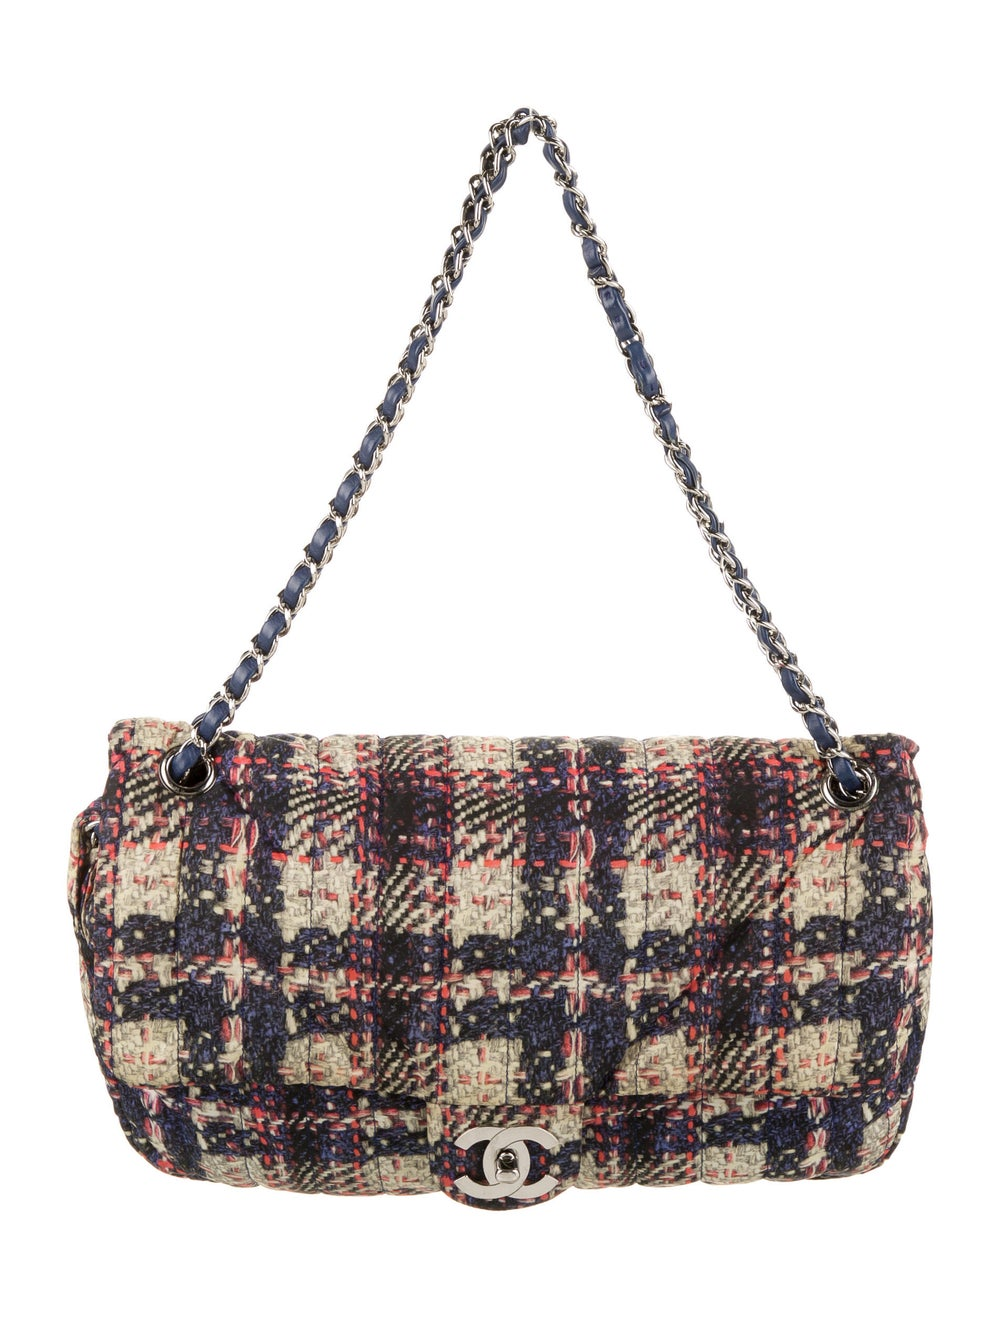 Chanel Medium Nylon Tweed Flap Bag Blue - image 1